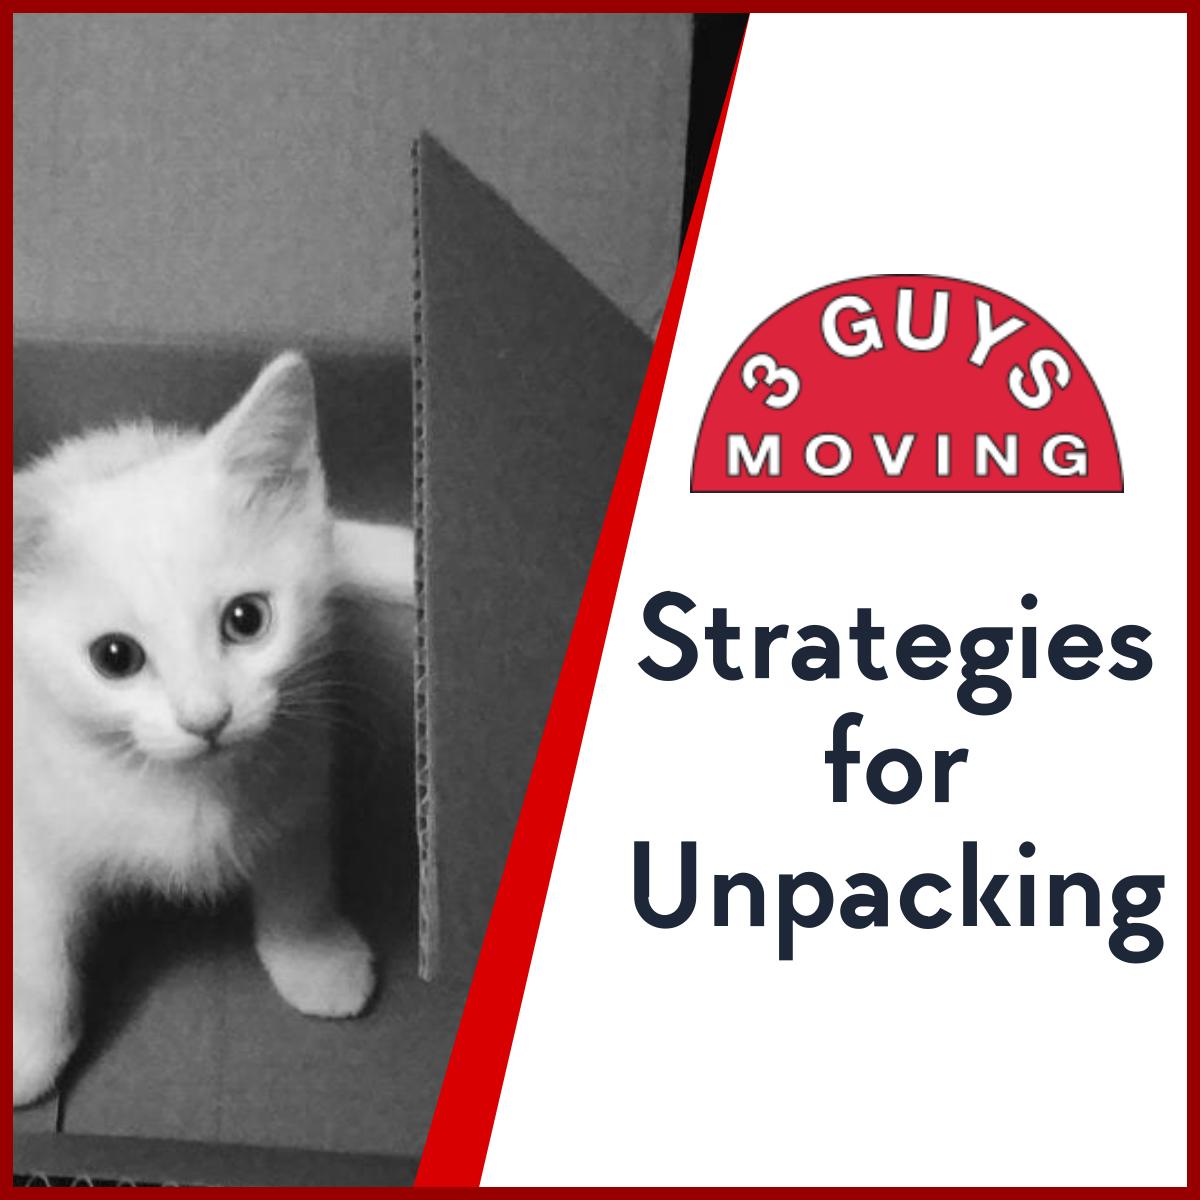 Strategies for Unpacking - Strategies for Unpacking